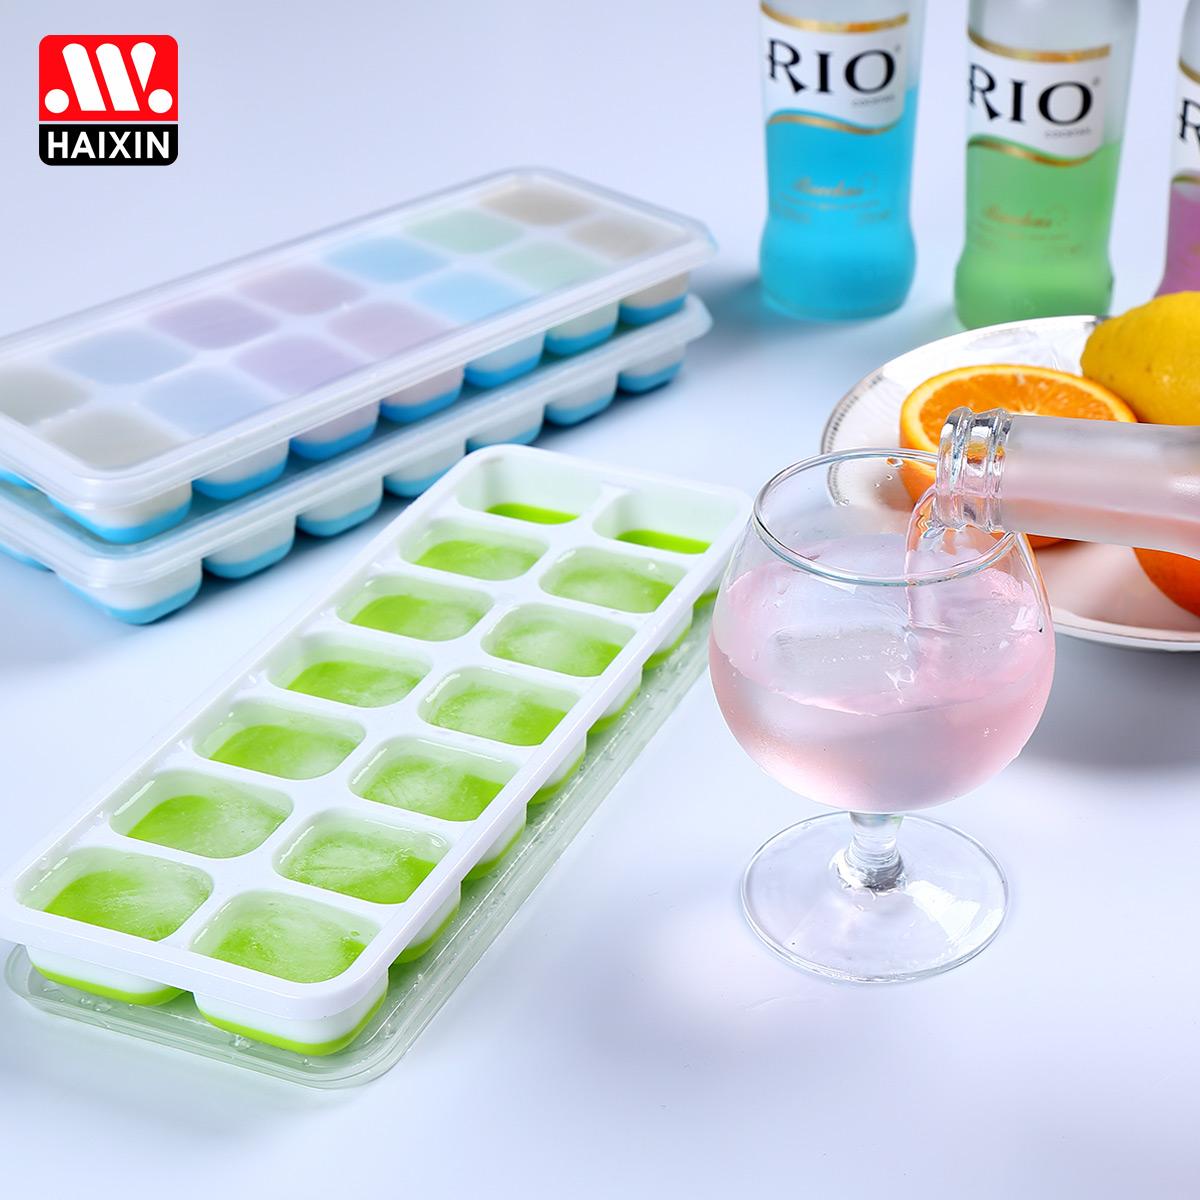 Haixin海興矽膠帶蓋冰格卡通冰塊模具 冰激淩雪糕模具 製冰盒